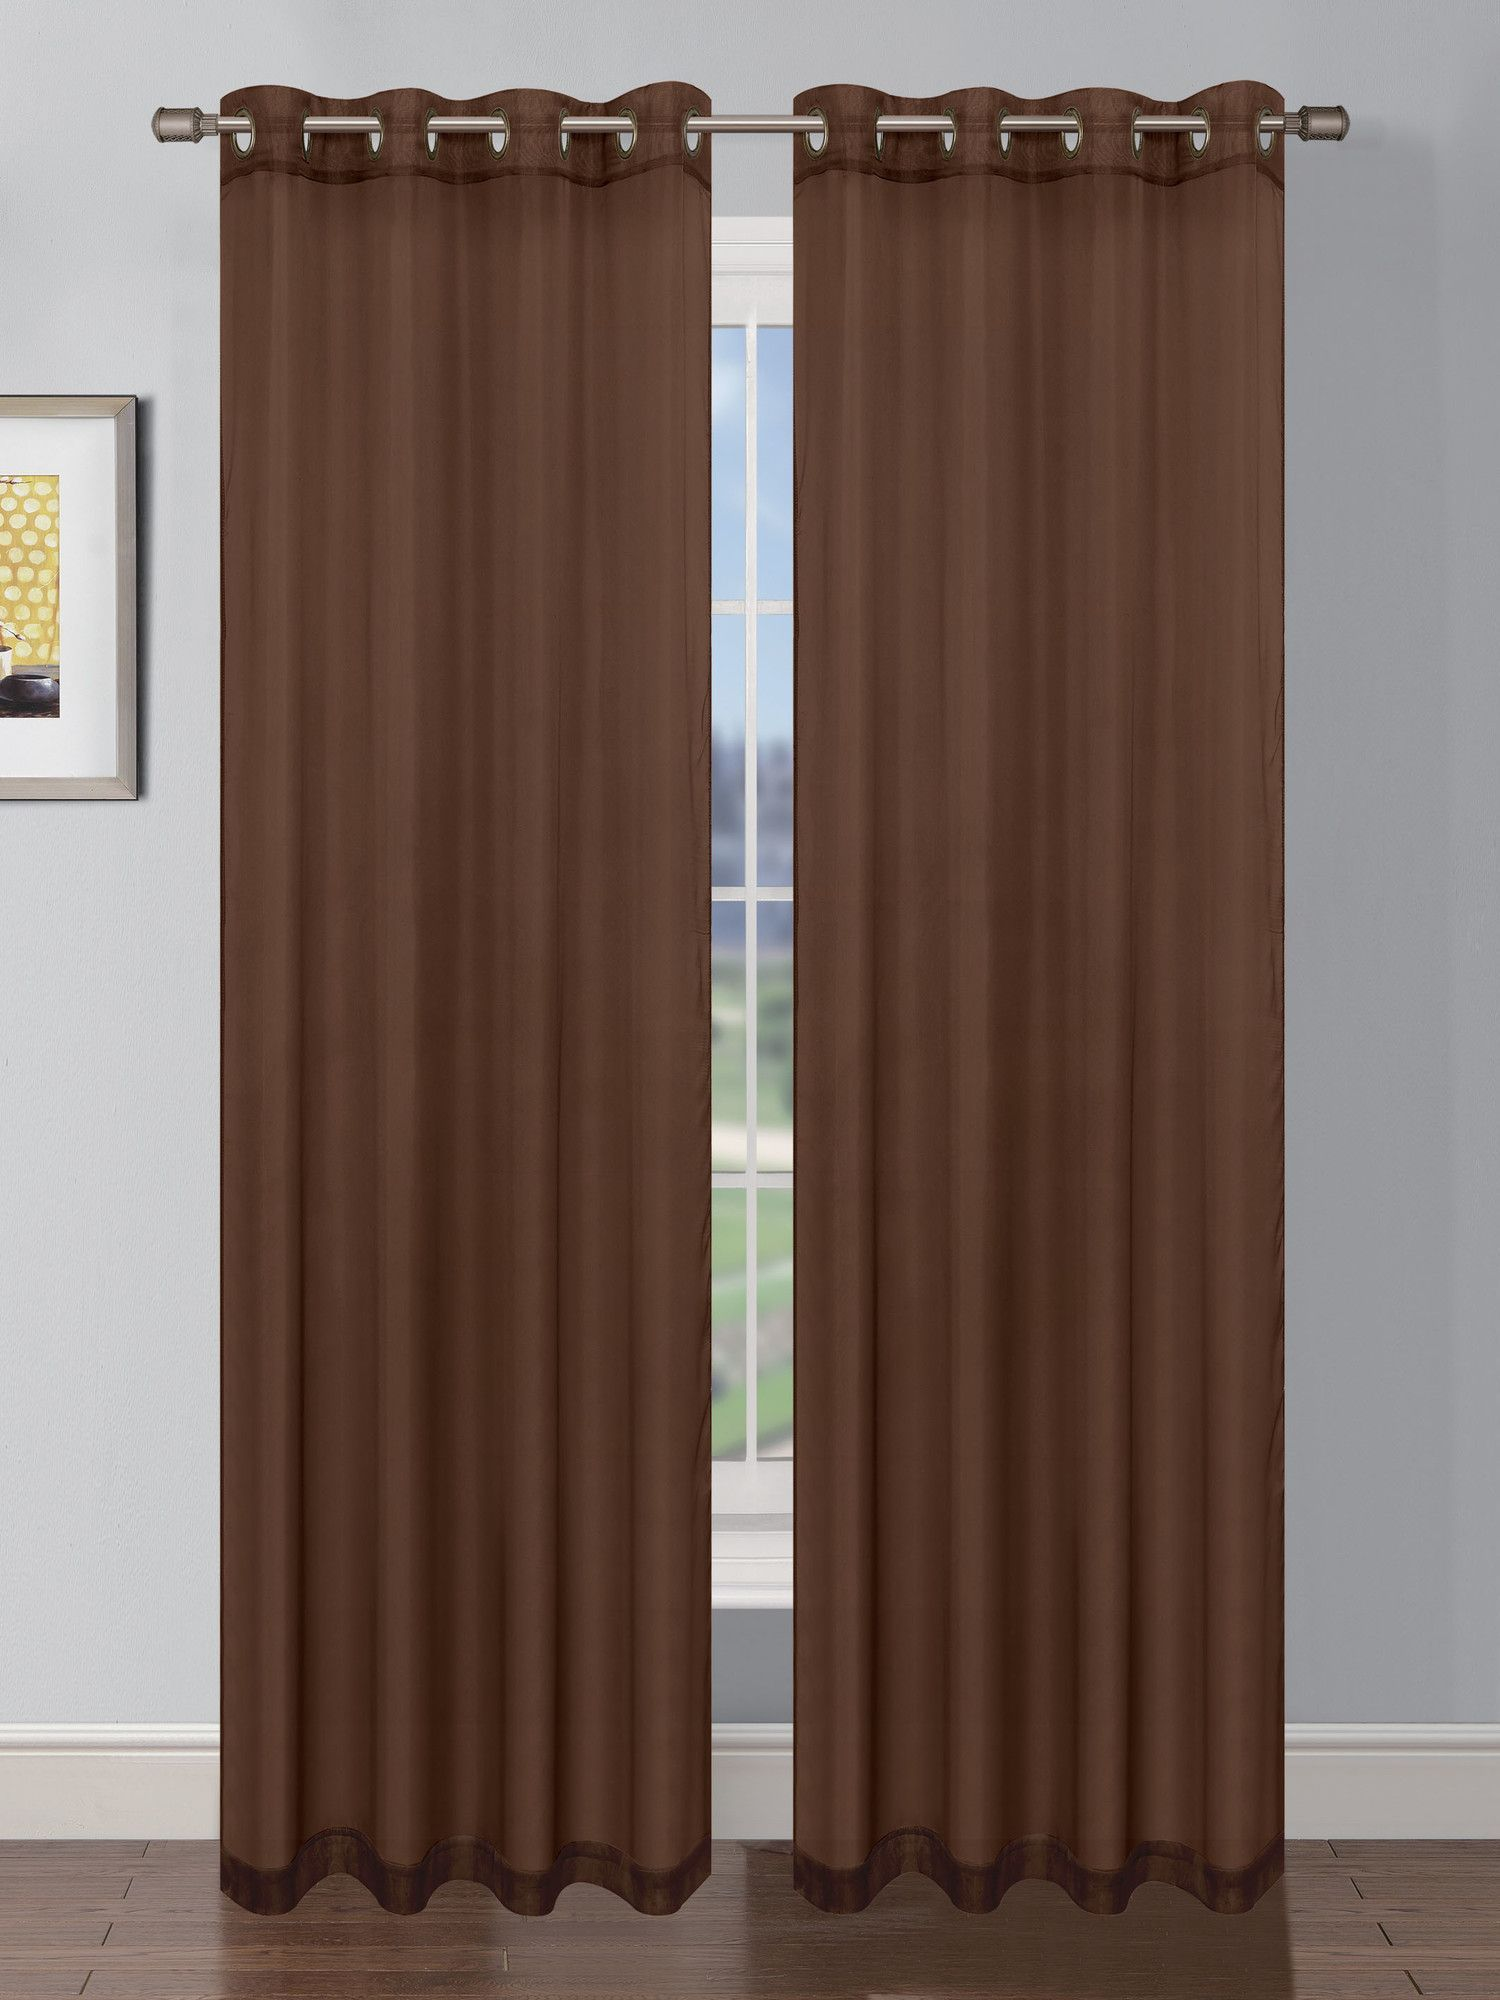 Sheer Elegance Faux Linen Grommet Extra Wide Curtain Panels